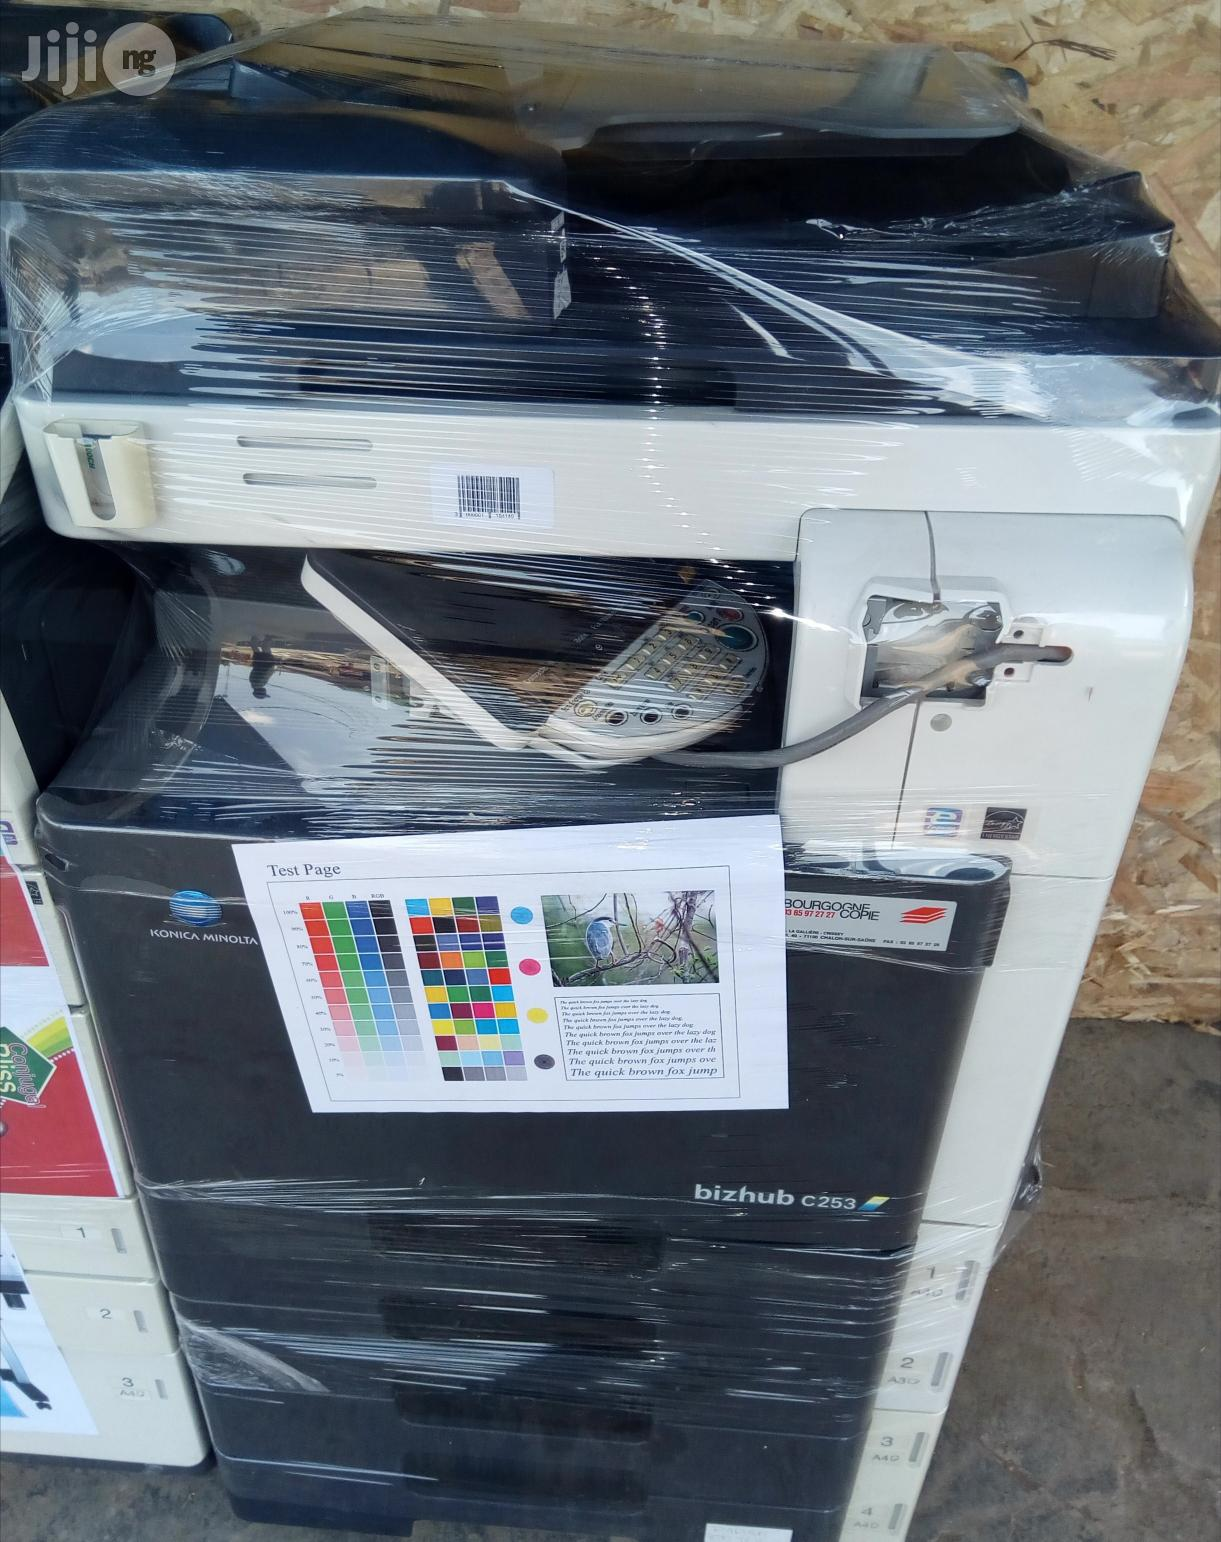 Konica Minolta Bizhub C253 Direct Image Printer/Photocopy